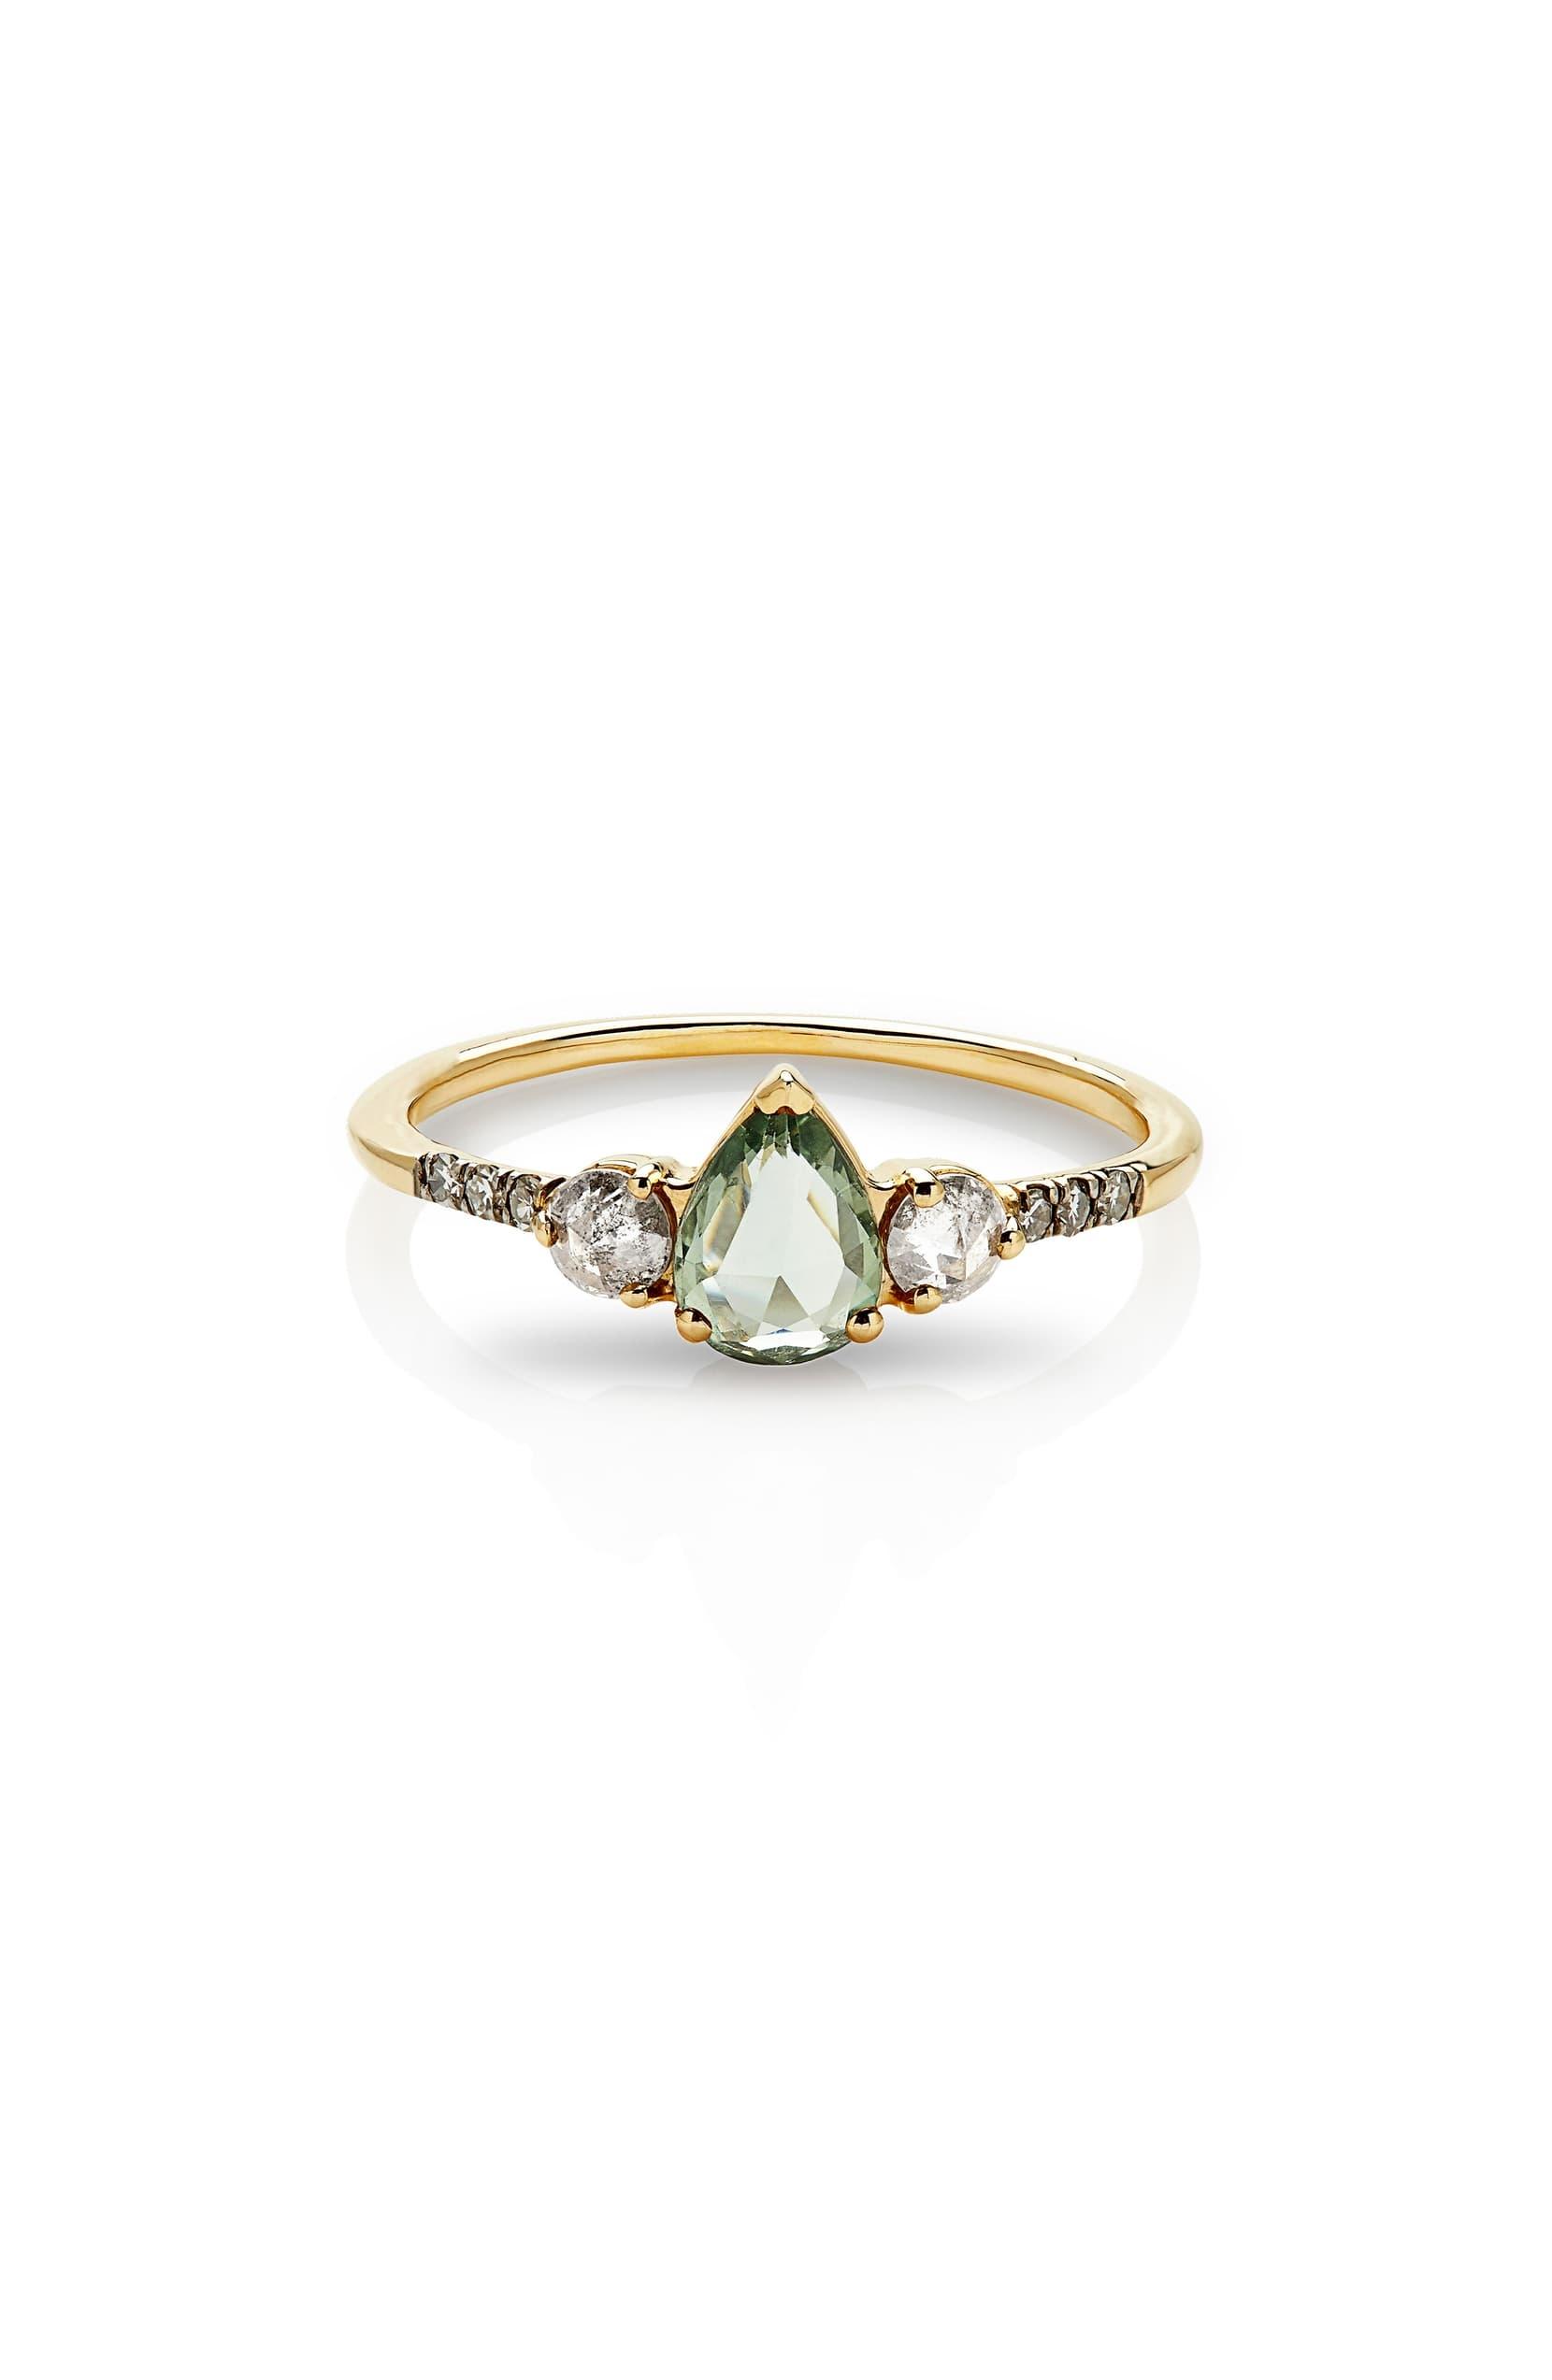 Radiance Sapphire & Diamond Engagement Ring